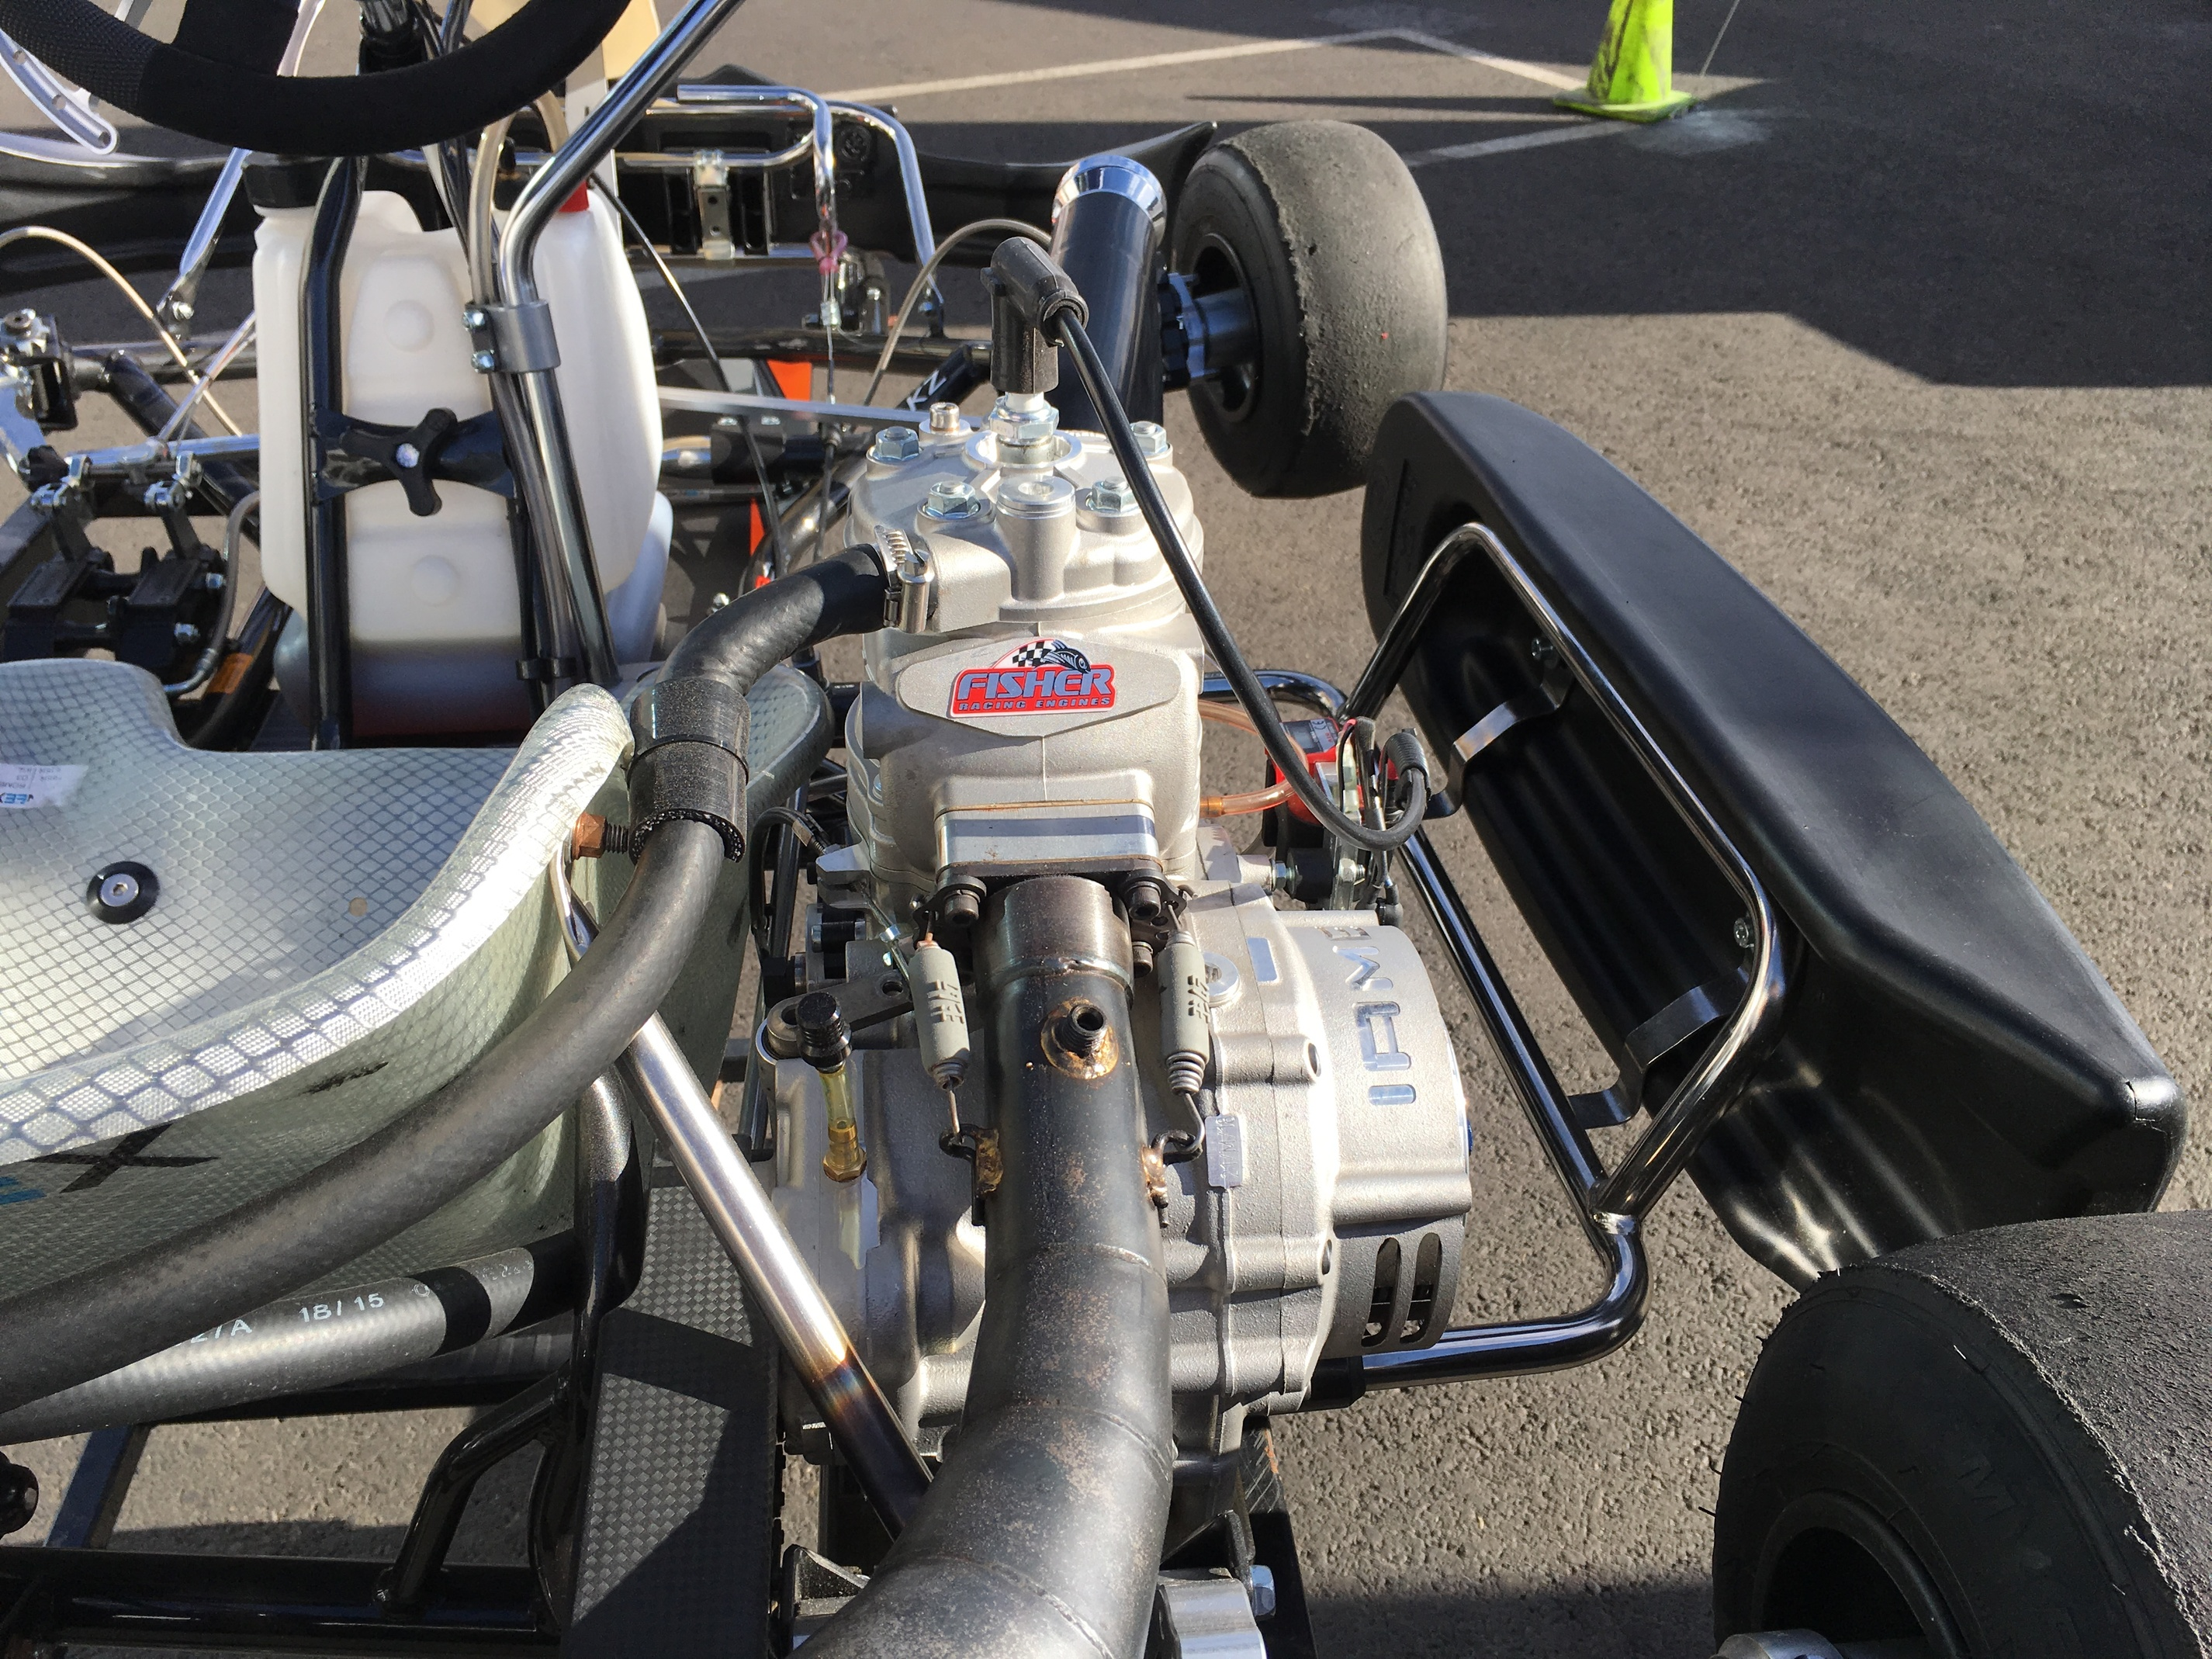 SKUSA IAME 175cc Shifter Pics and Details - 2 Stroke Engine